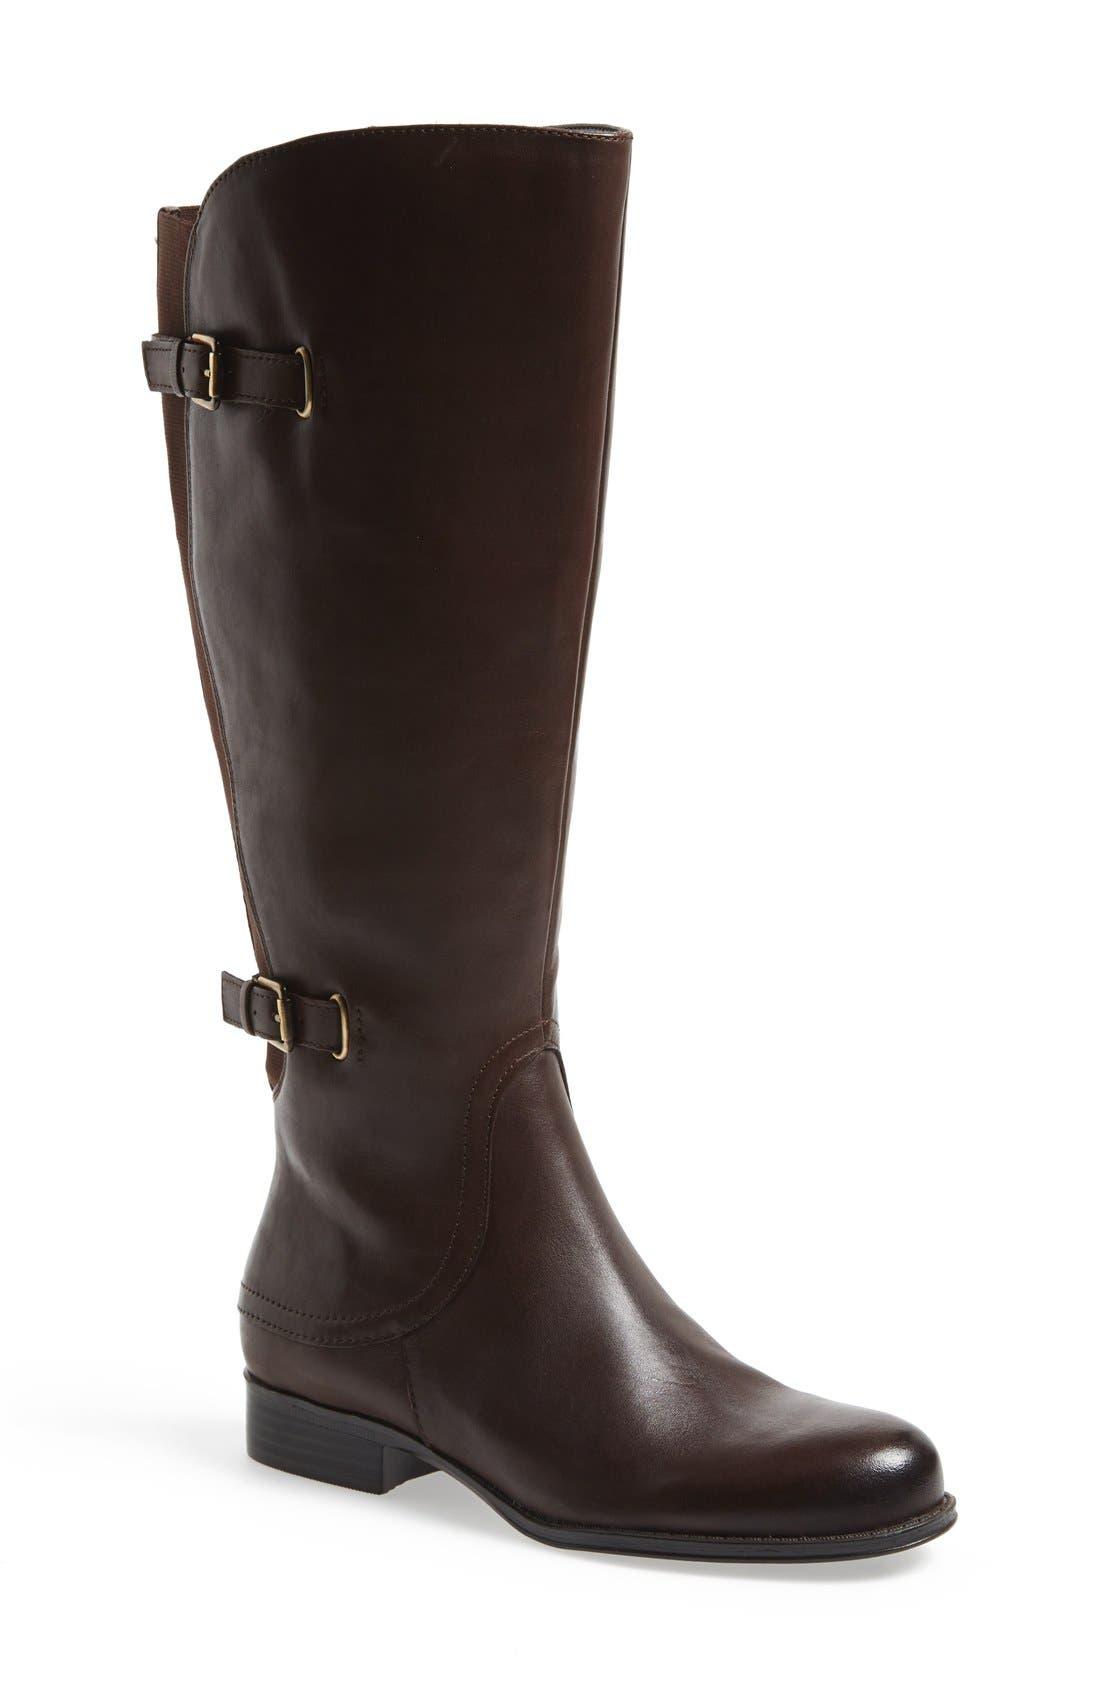 Alternate Image 1 Selected - Naturalizer 'Jamison' Tall Boot (Wide Calf) (Women)